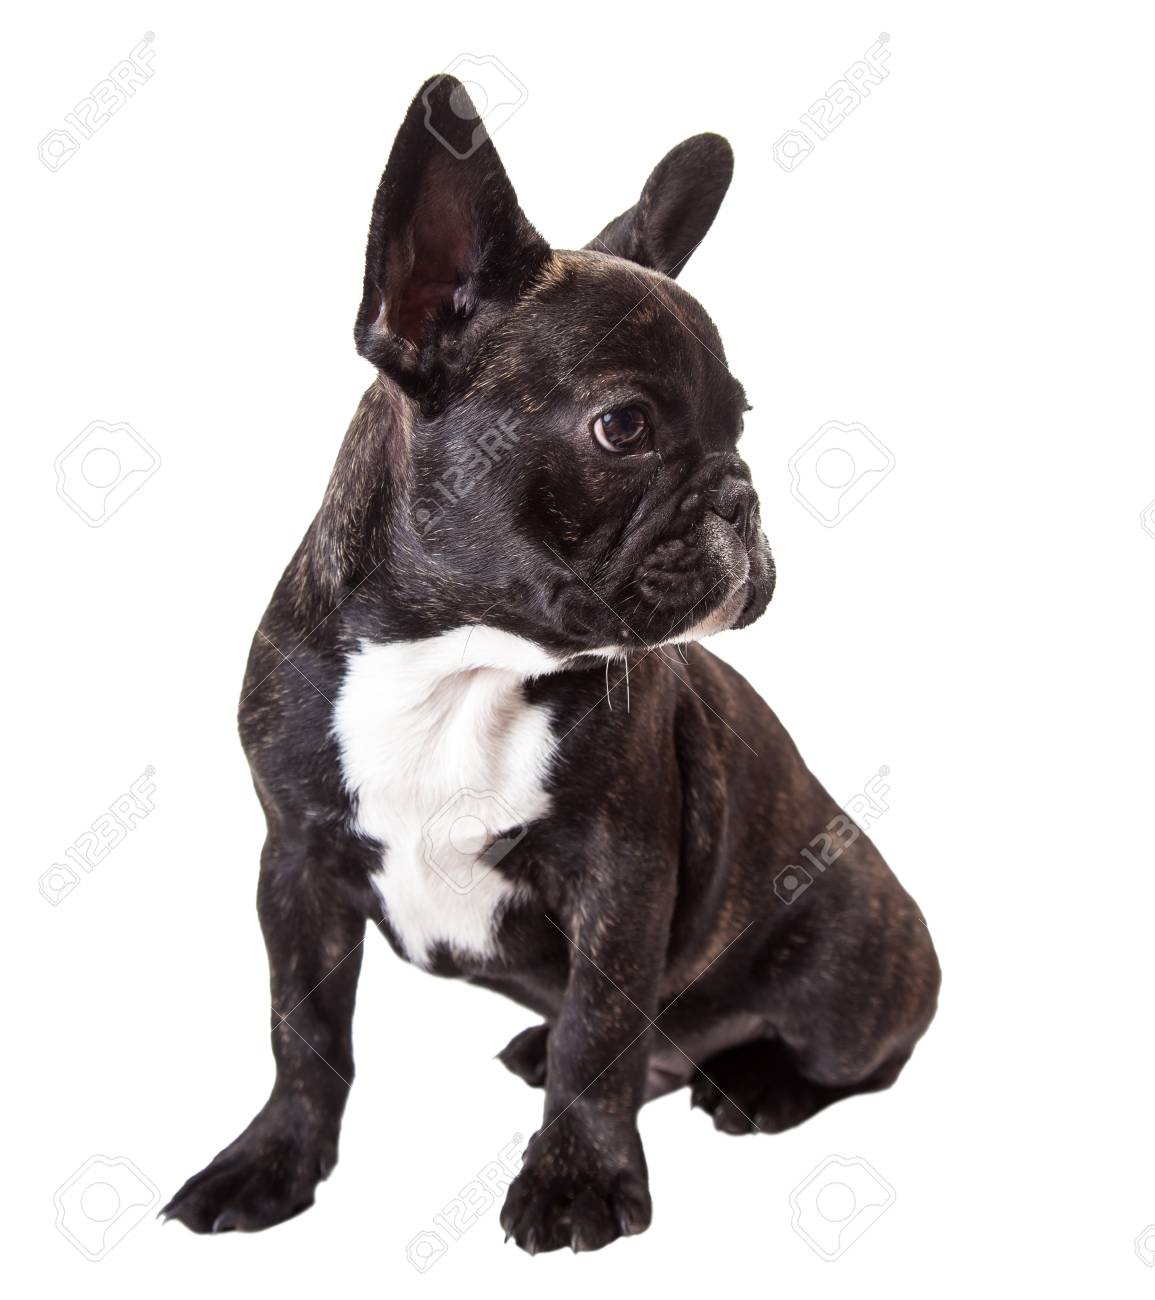 Baby French Bulldog Isolated On A White Background Stock Photo